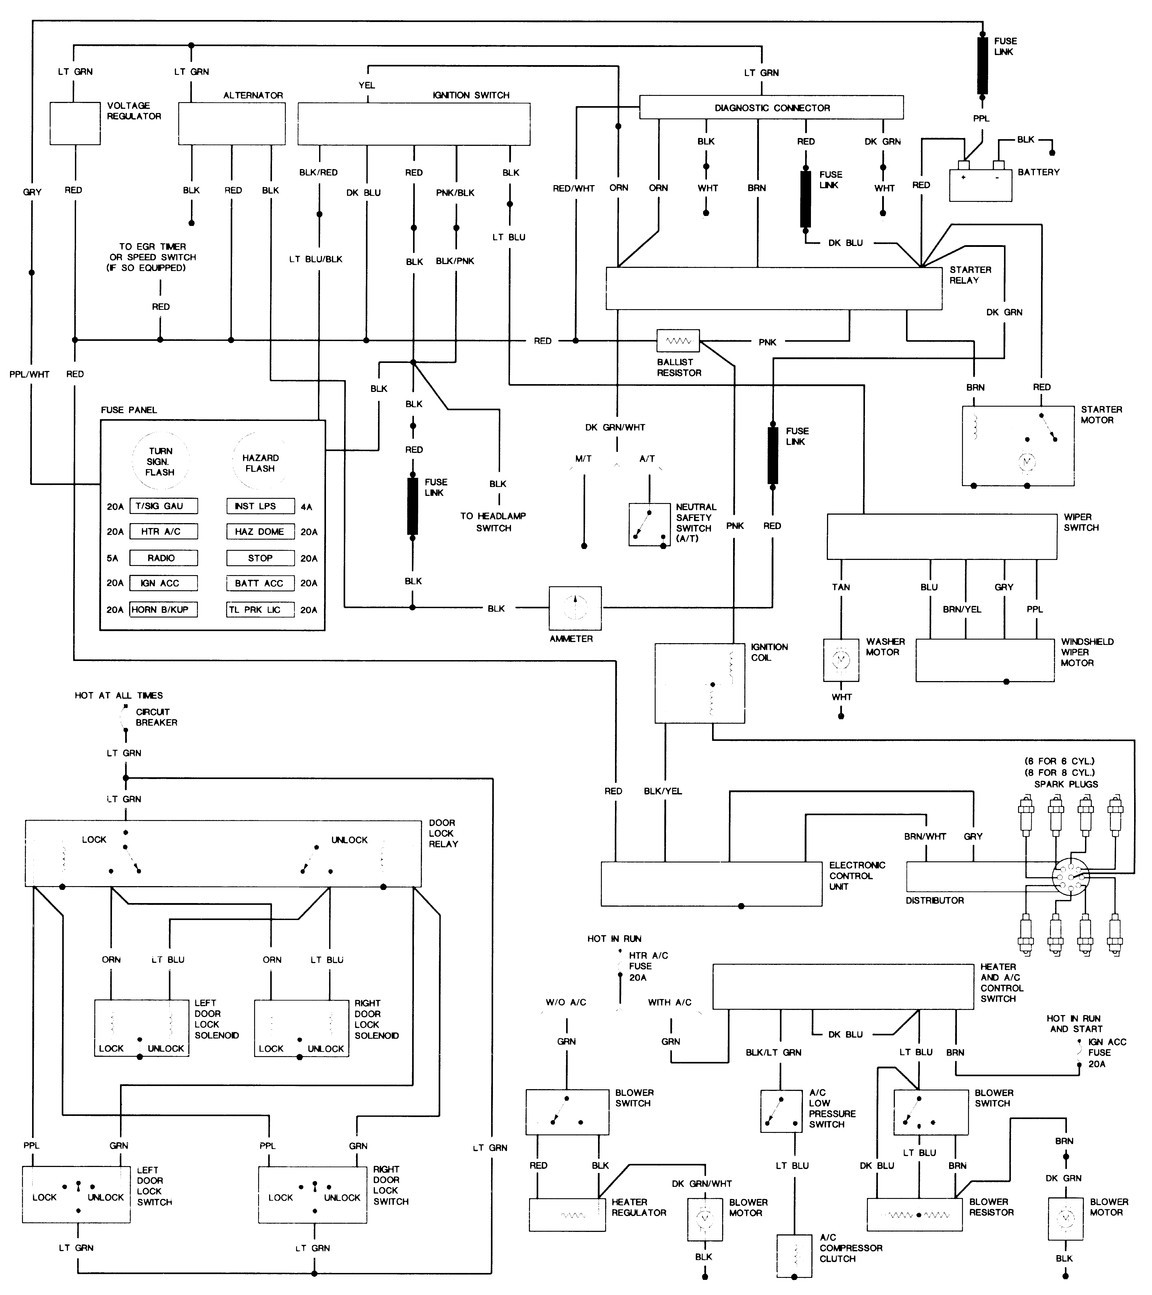 dodge ram wiring harness diagram dodge motorhome wiring diagram pro wiring diagram 2004 dodge ram wiring harness diagram dodge motorhome wiring diagram pro